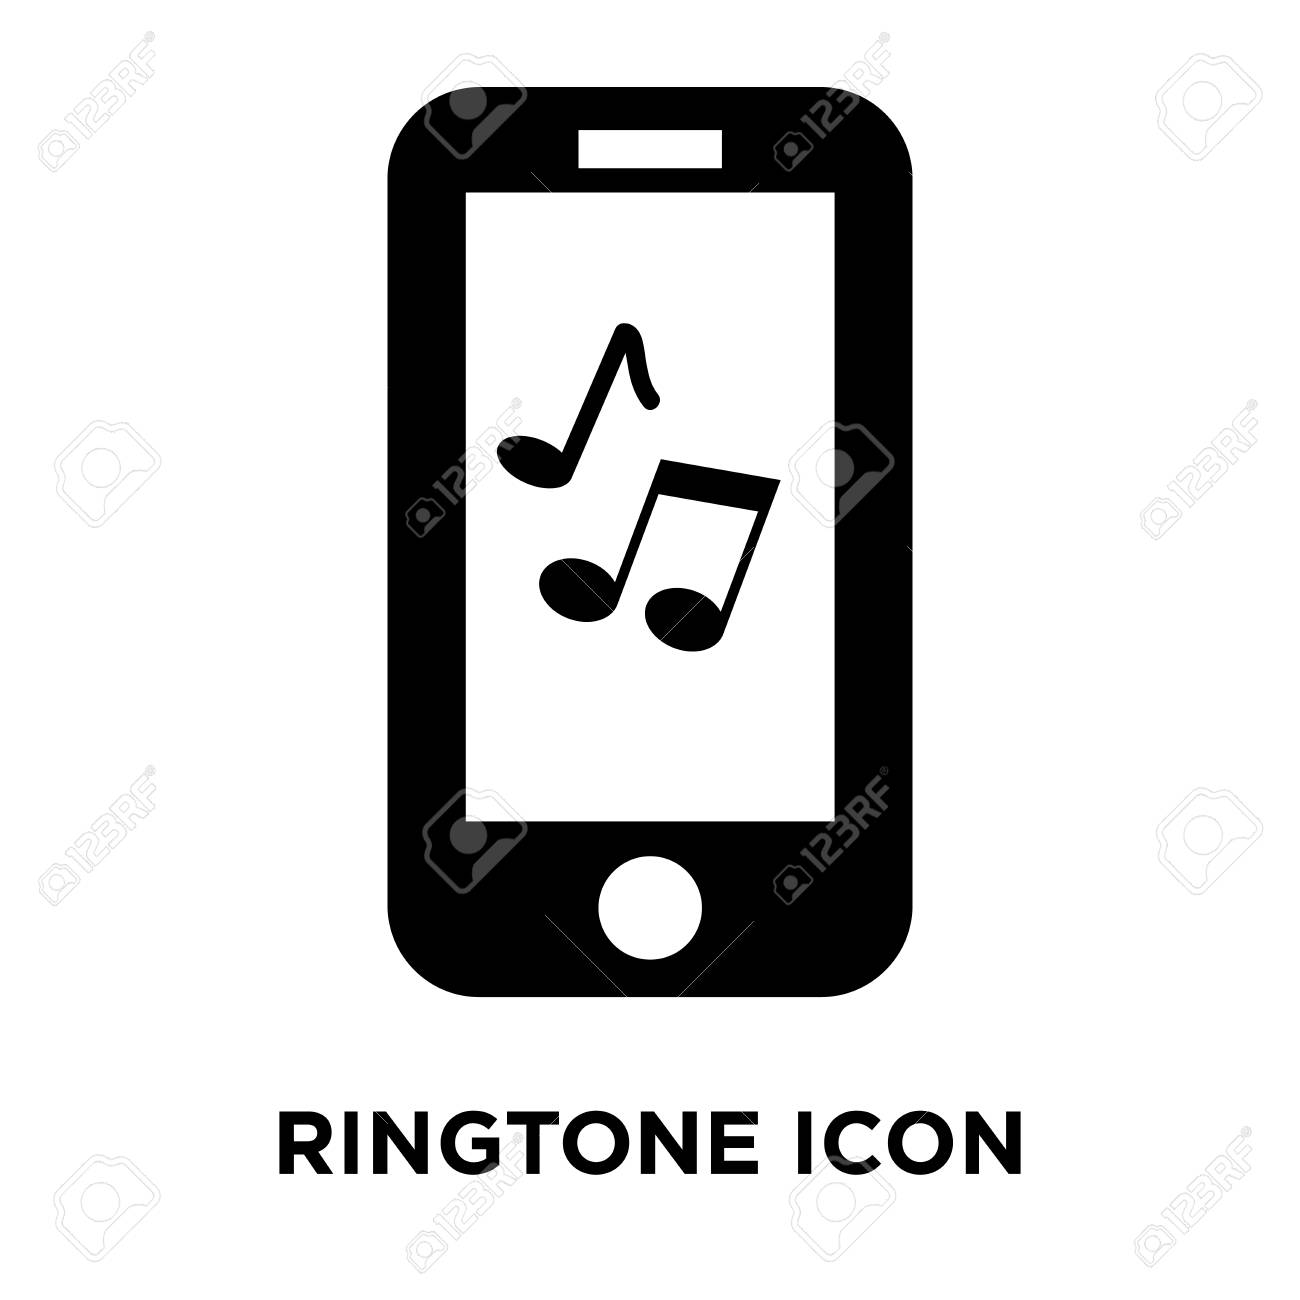 Ringtone icon vector isolated on white background, logo concept